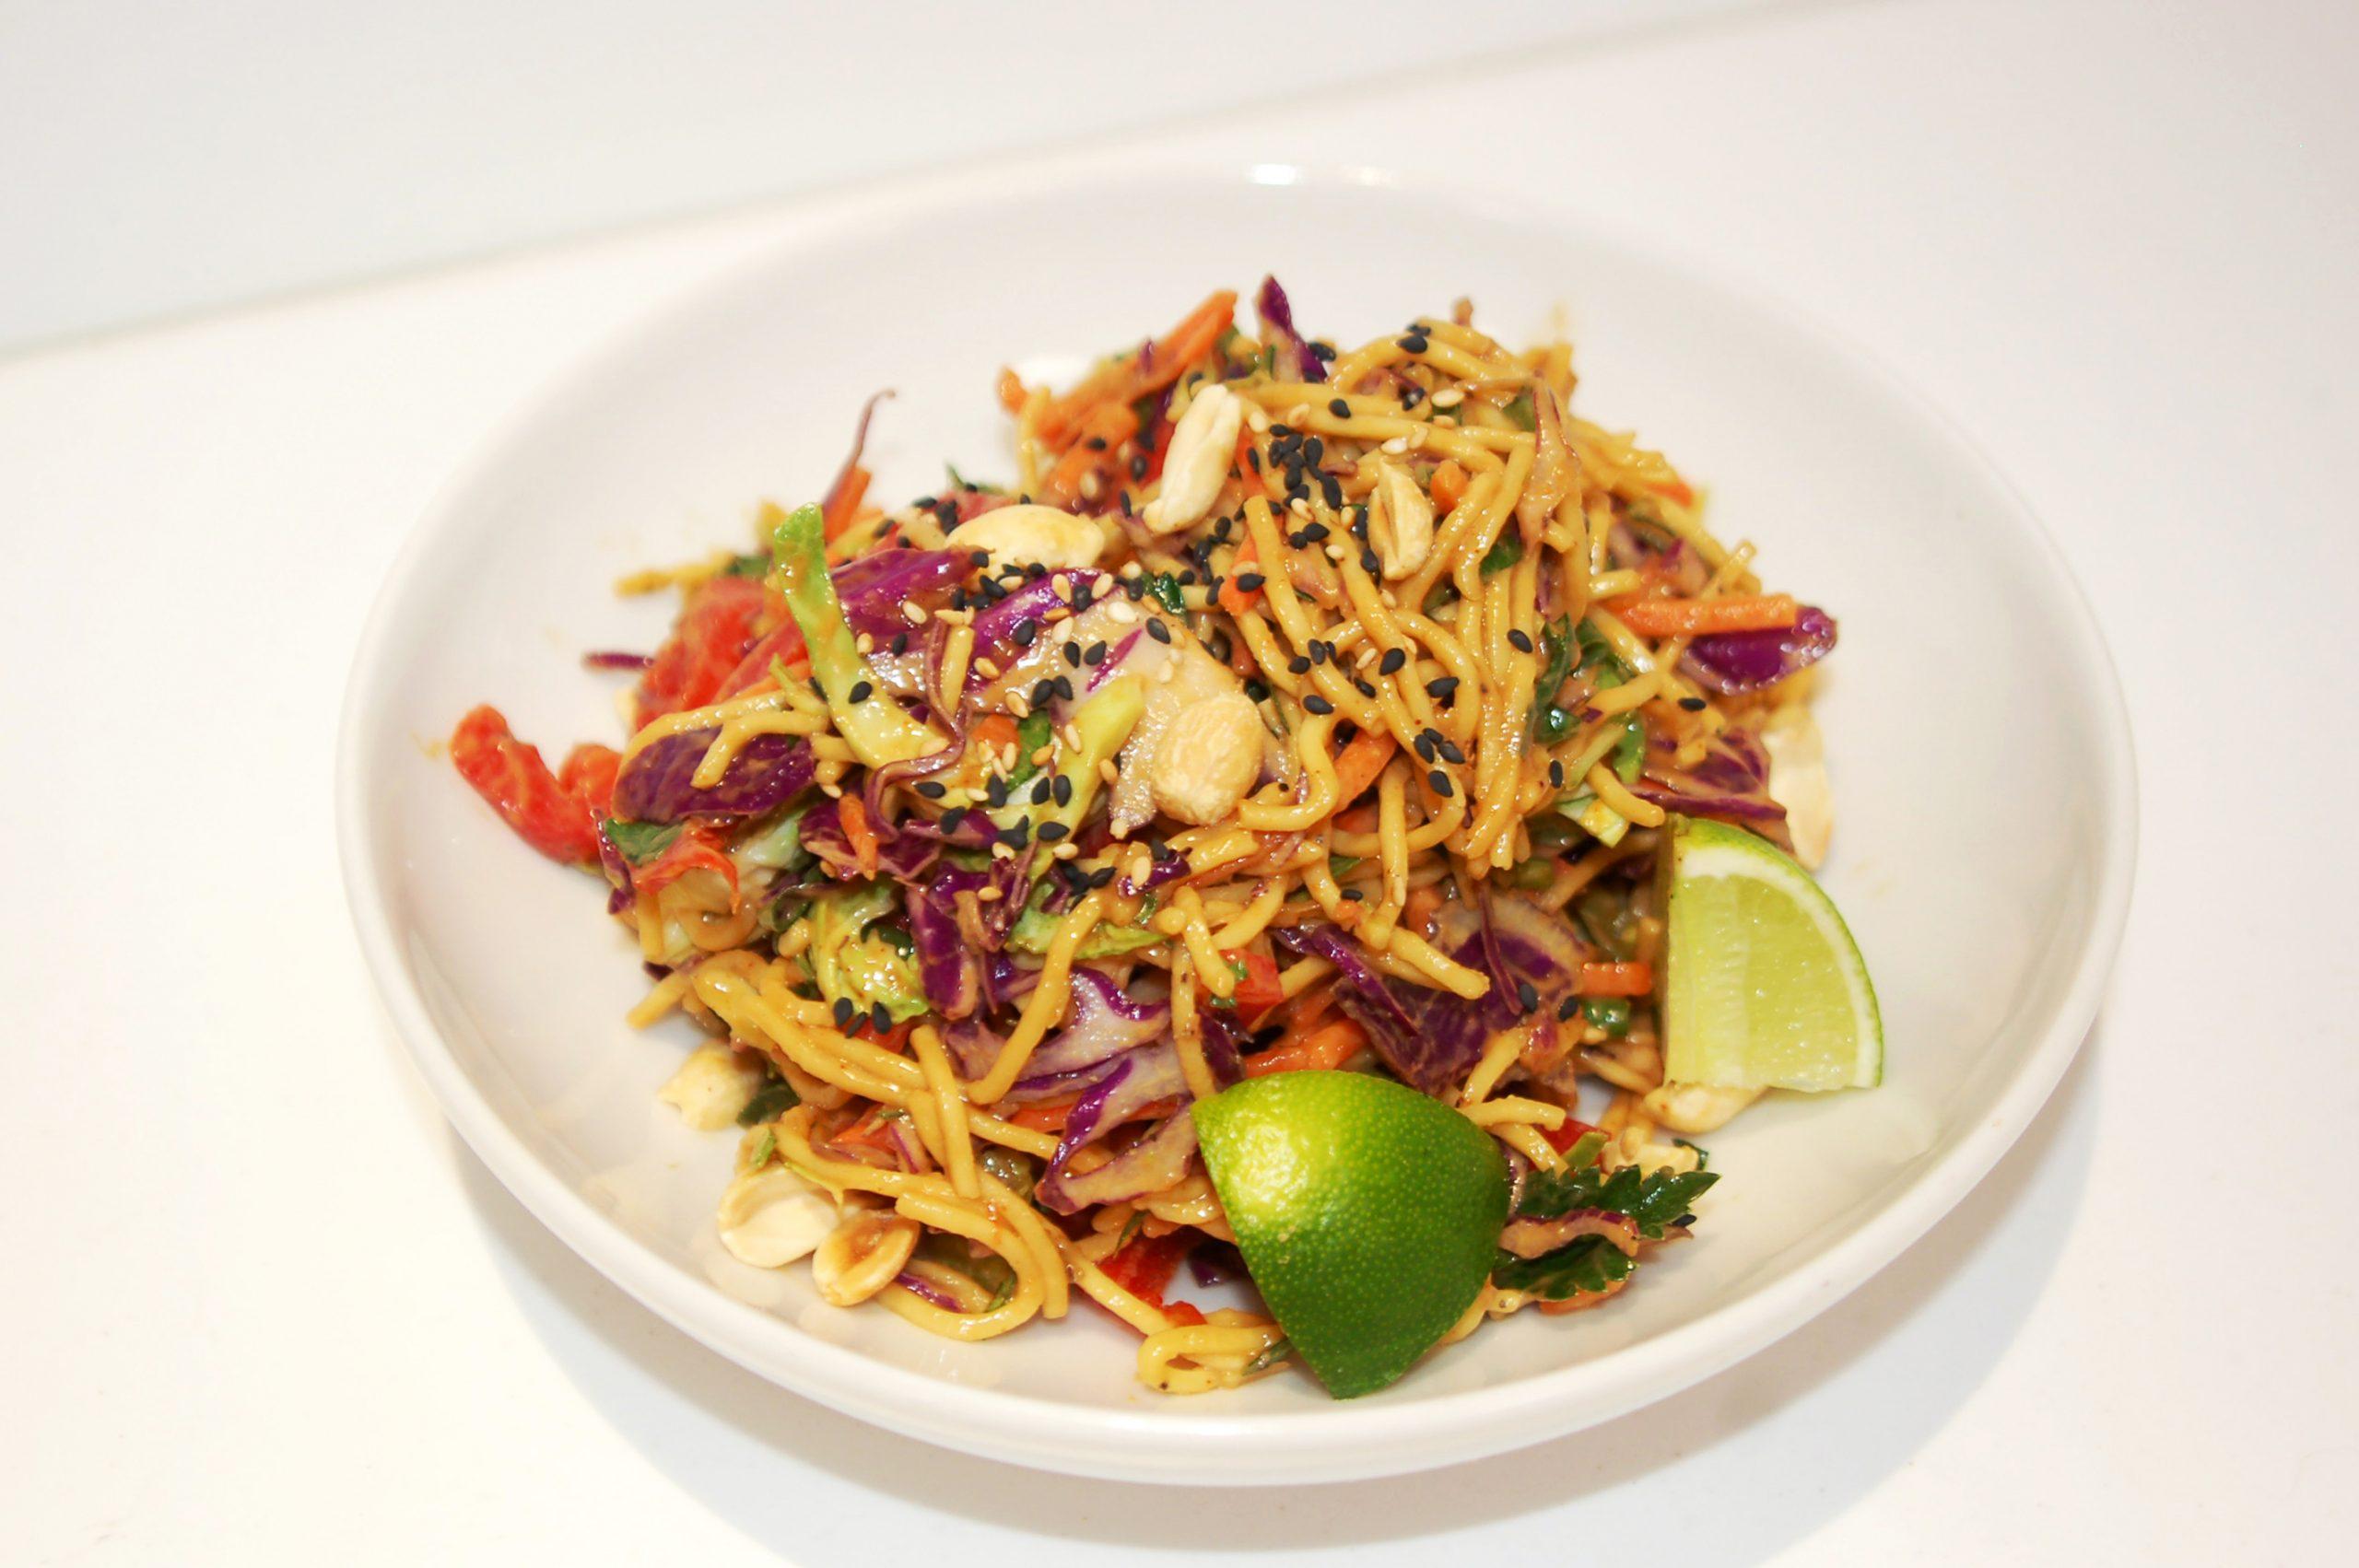 Spicy Sesame Peanut Noodle Salad